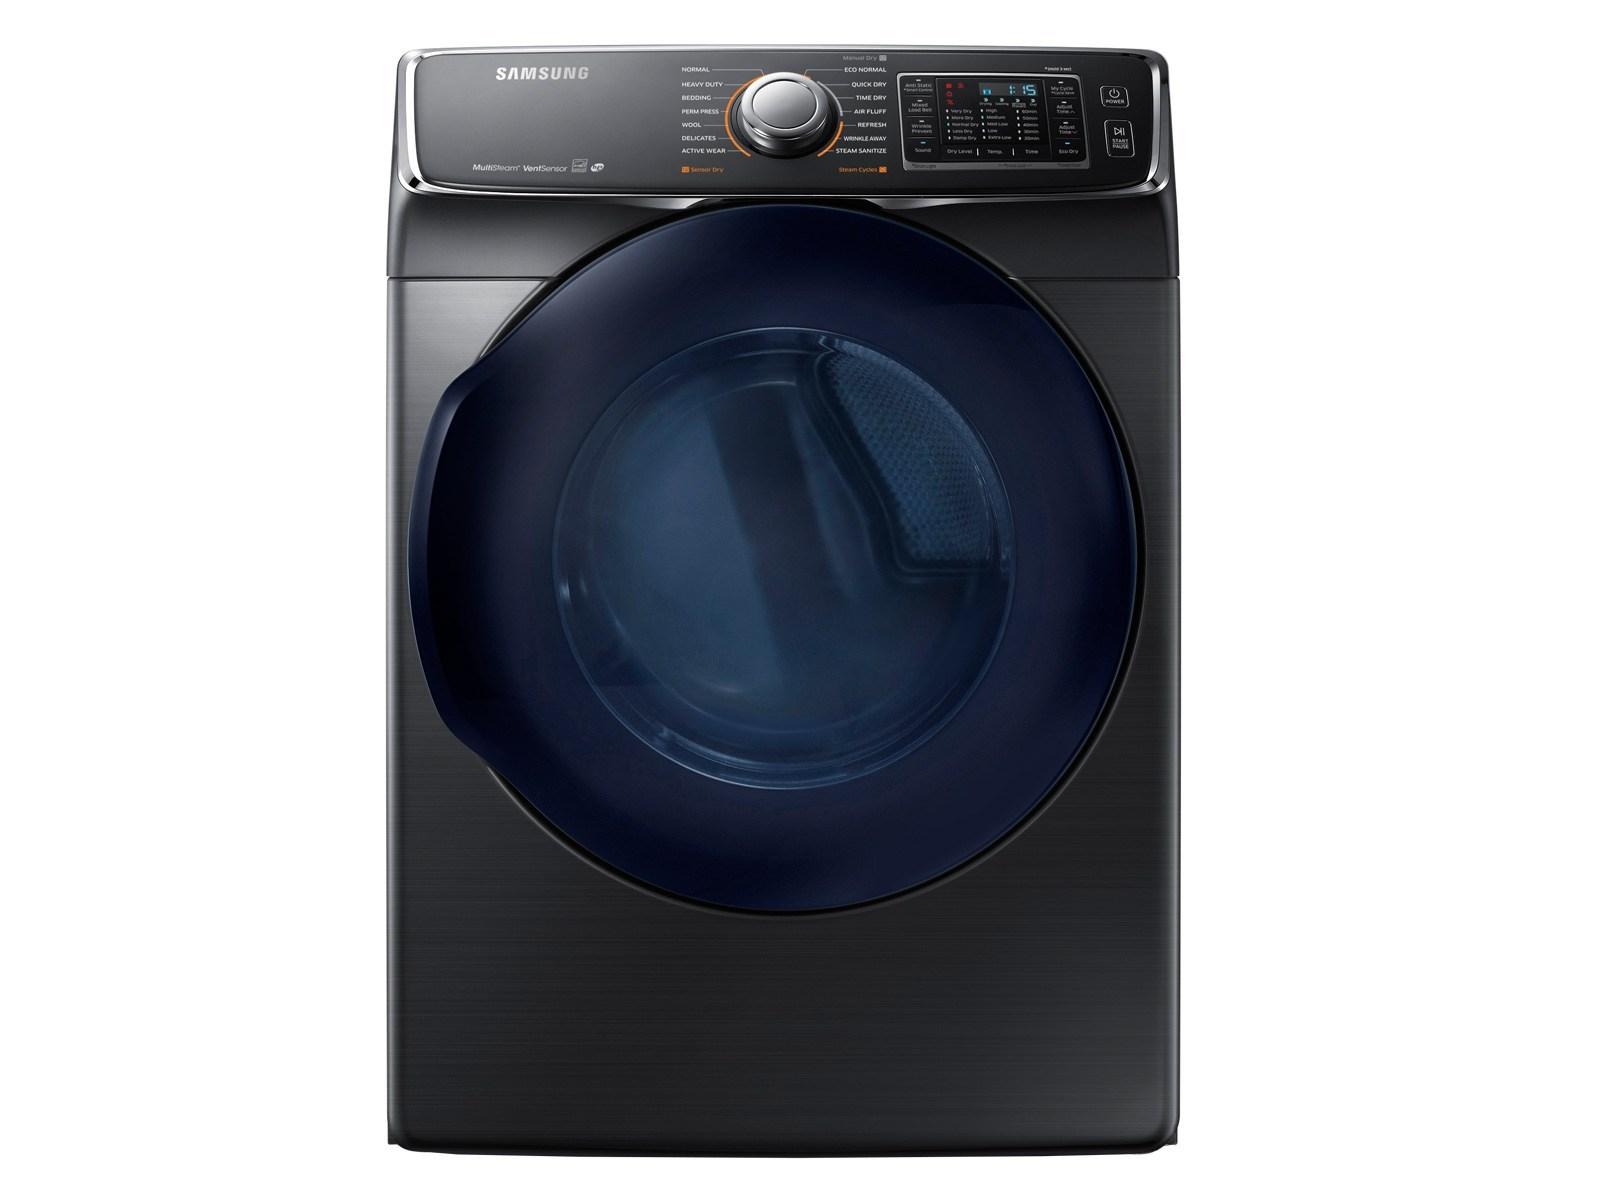 Samsung 7.5 cu. ft. Electric Dryer in Black Stainless Steel, Fingerprint Resistant Black Stainless Steel